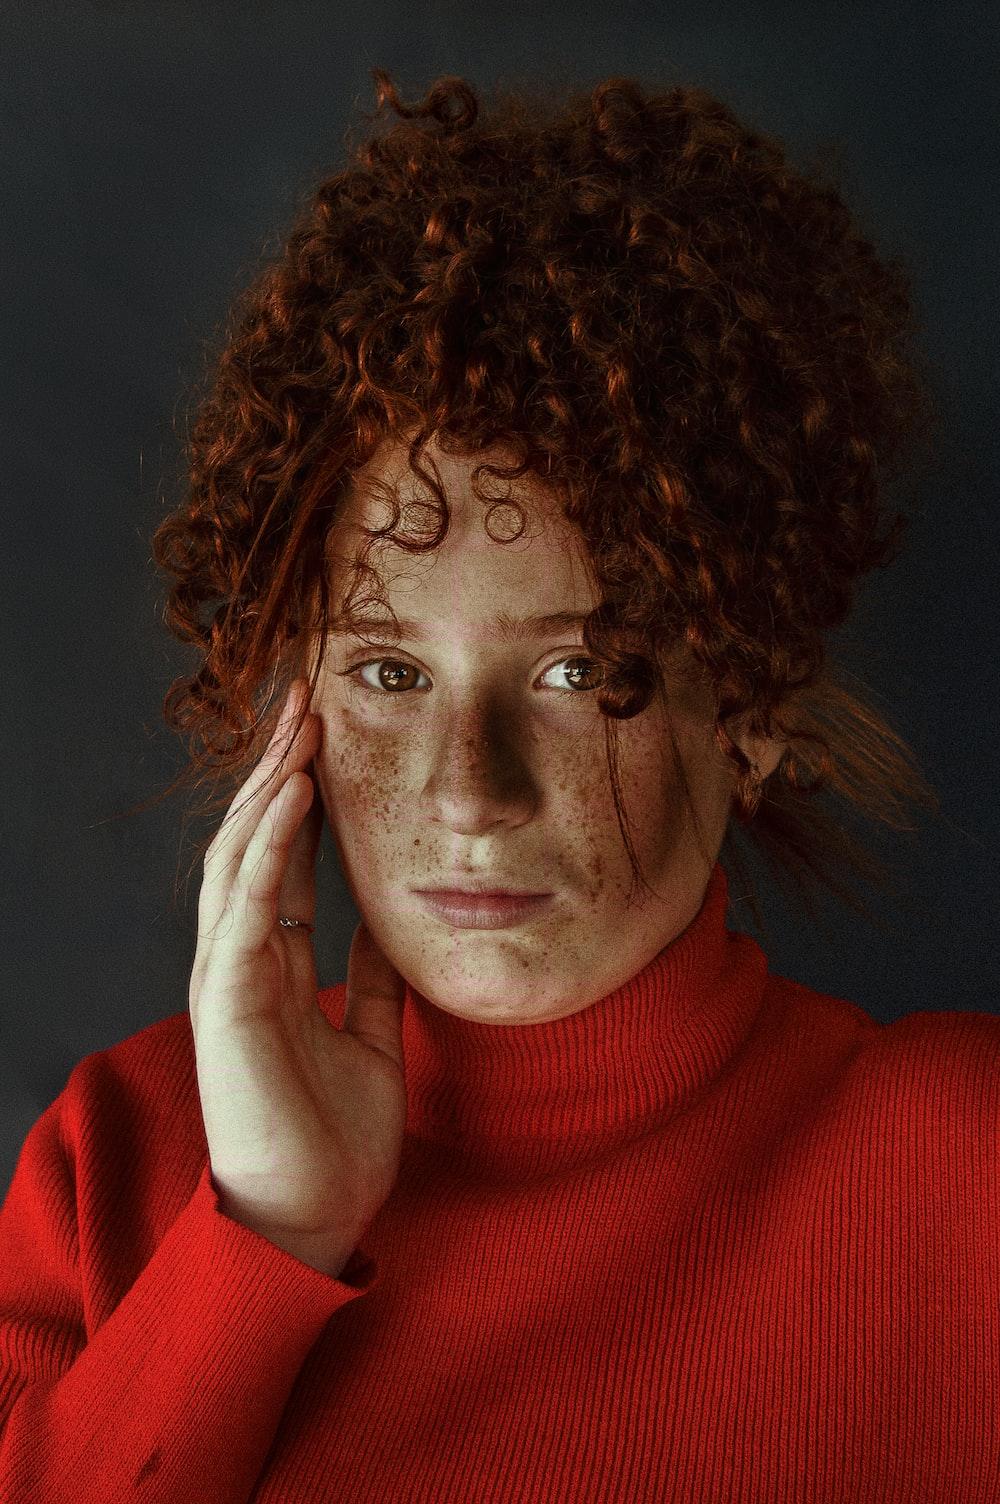 woman in red turtleneck sweater wearing silver framed eyeglasses